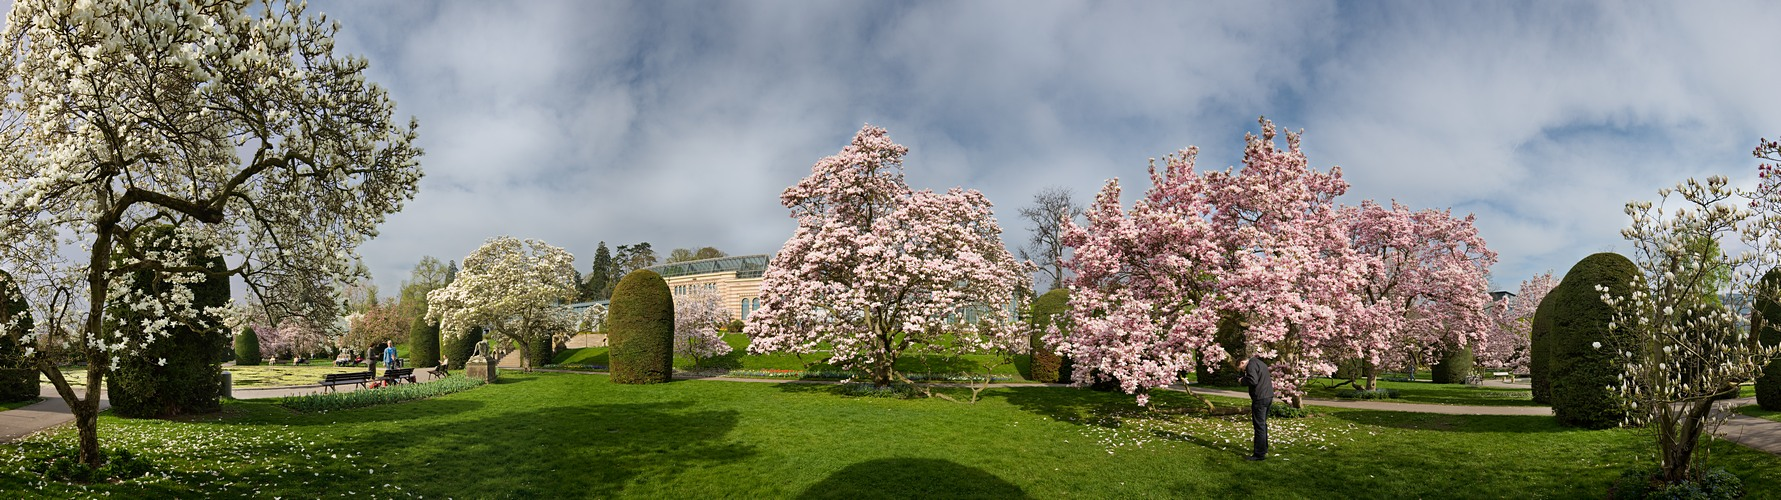 Magnolien Panorama 1